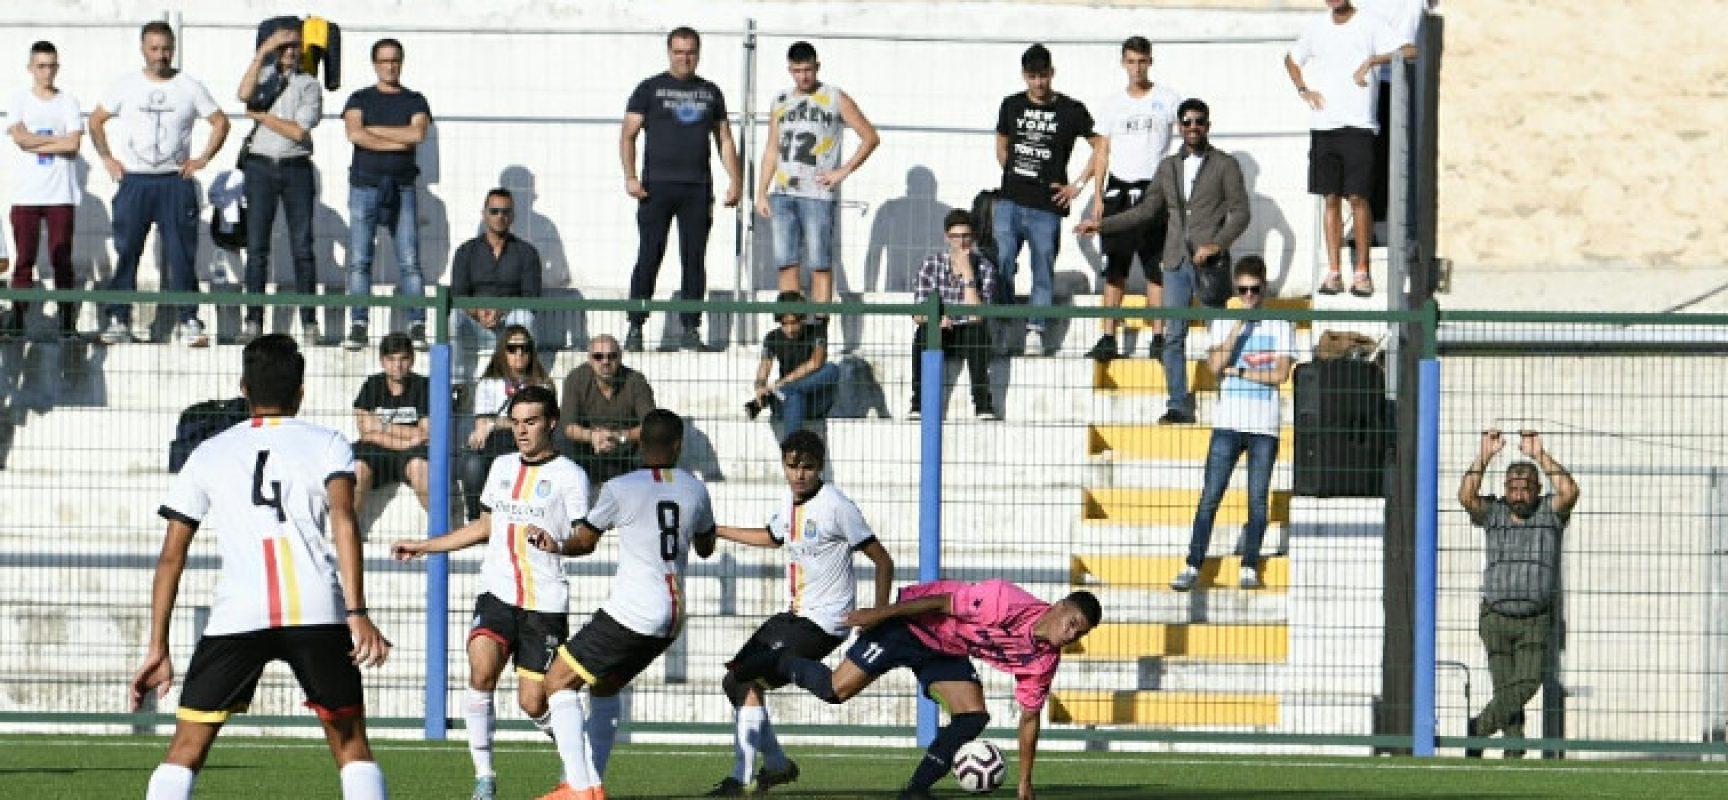 Unione Calcio, pari casalingo contro l'Ugento